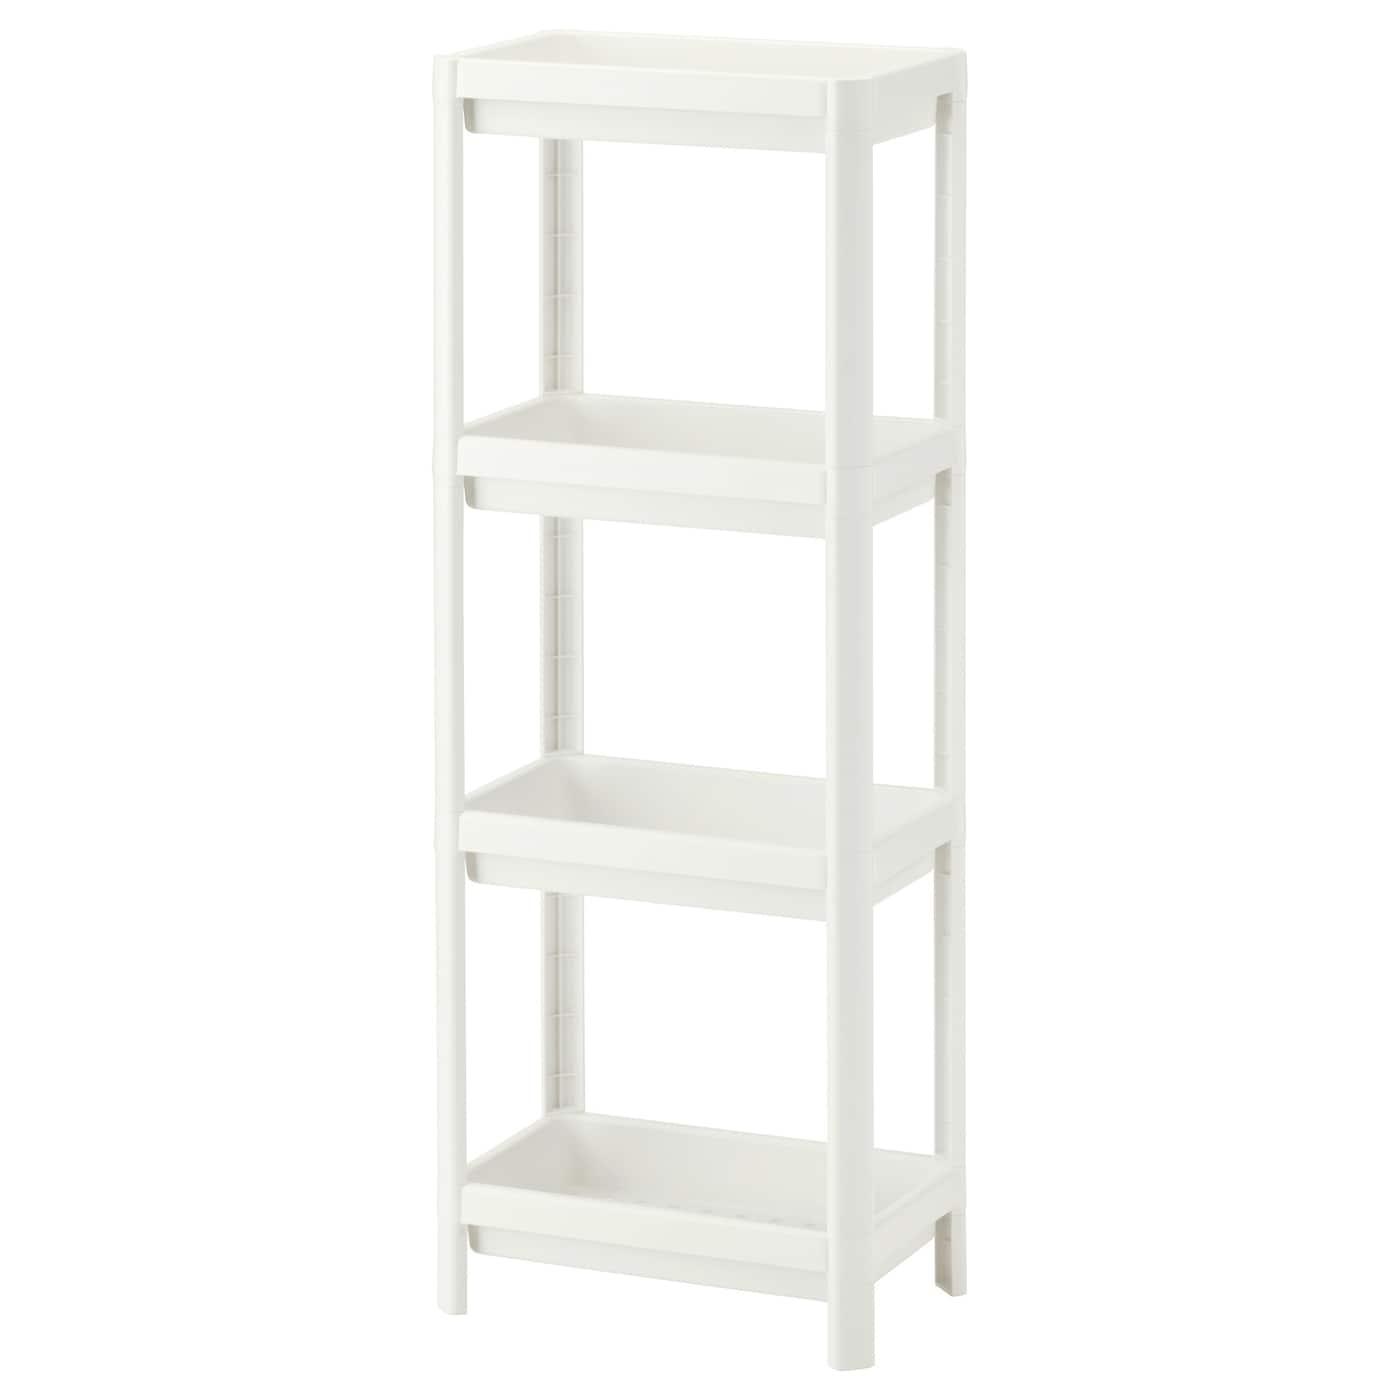 Vesken Shelf Unit White 14 1 8x9x39 3 8 Ikea